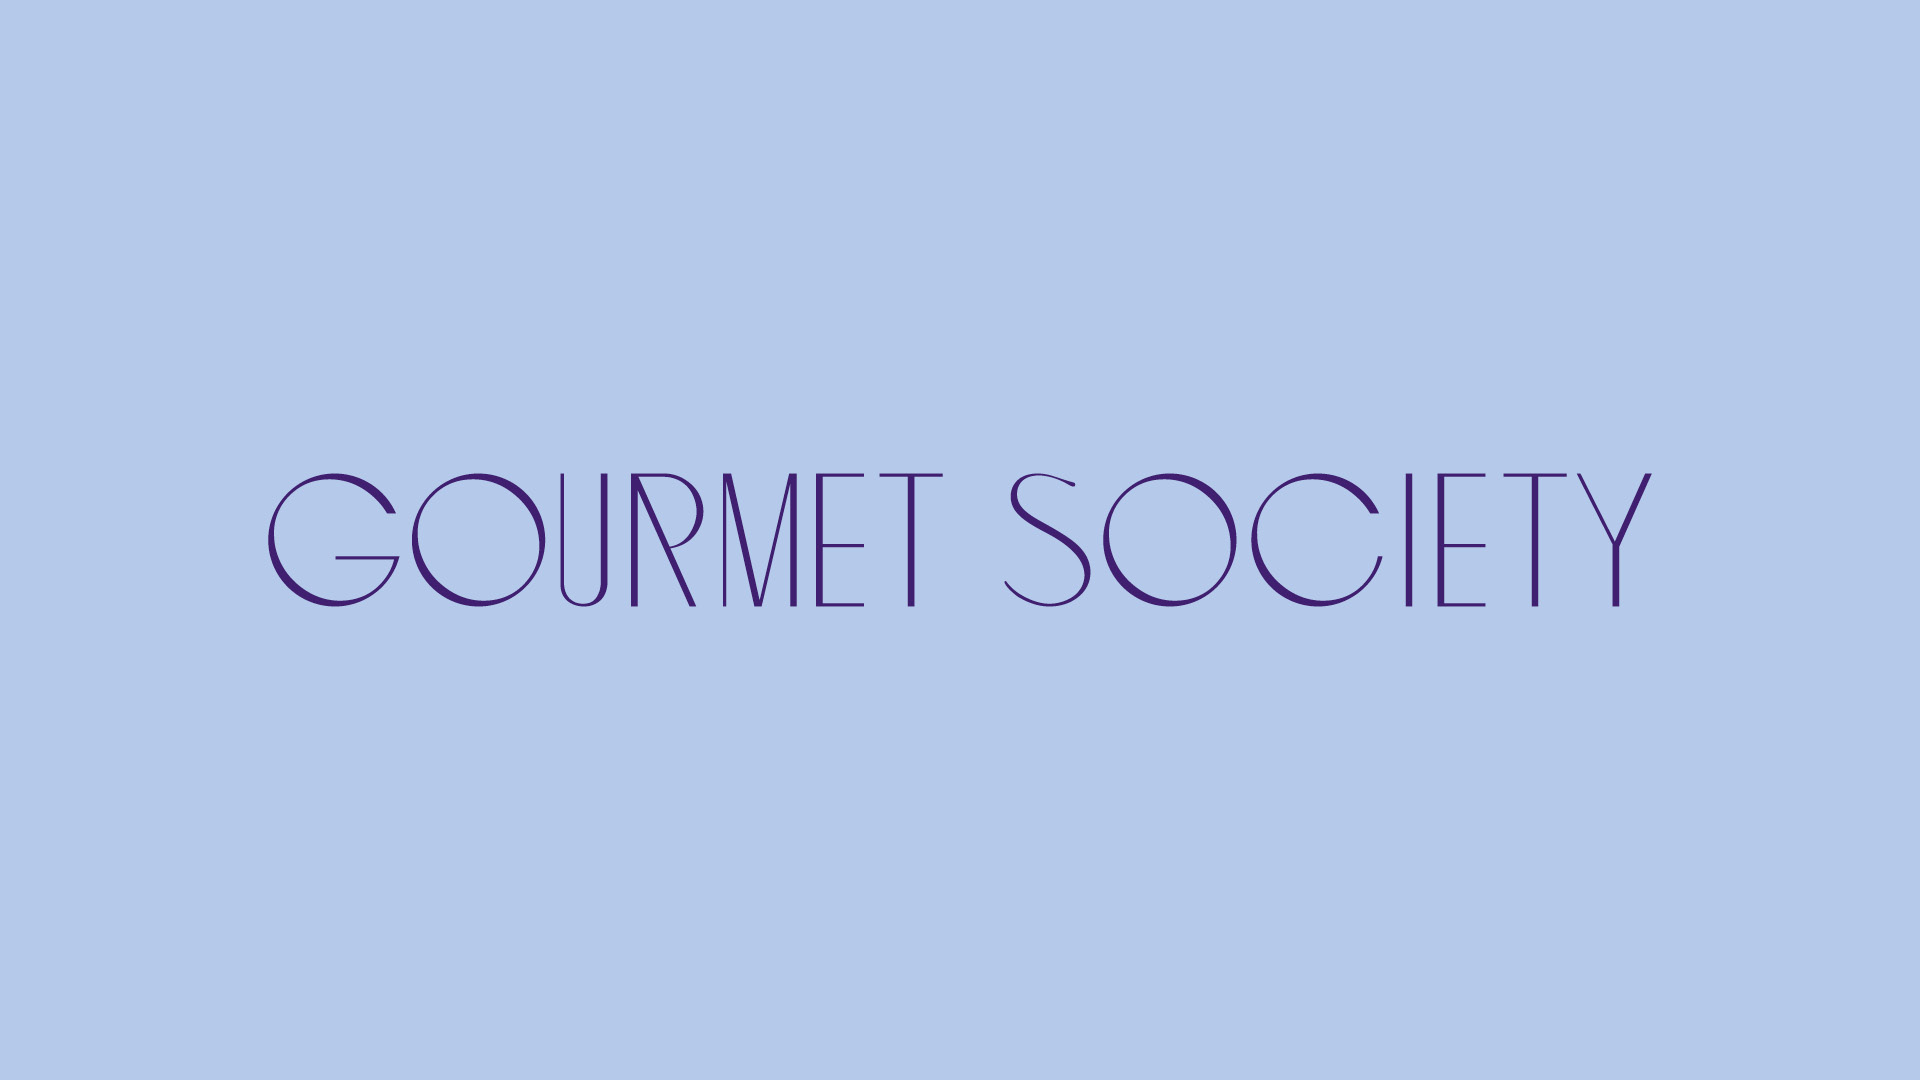 GourmetSociety-Work-By-YaStudio-19